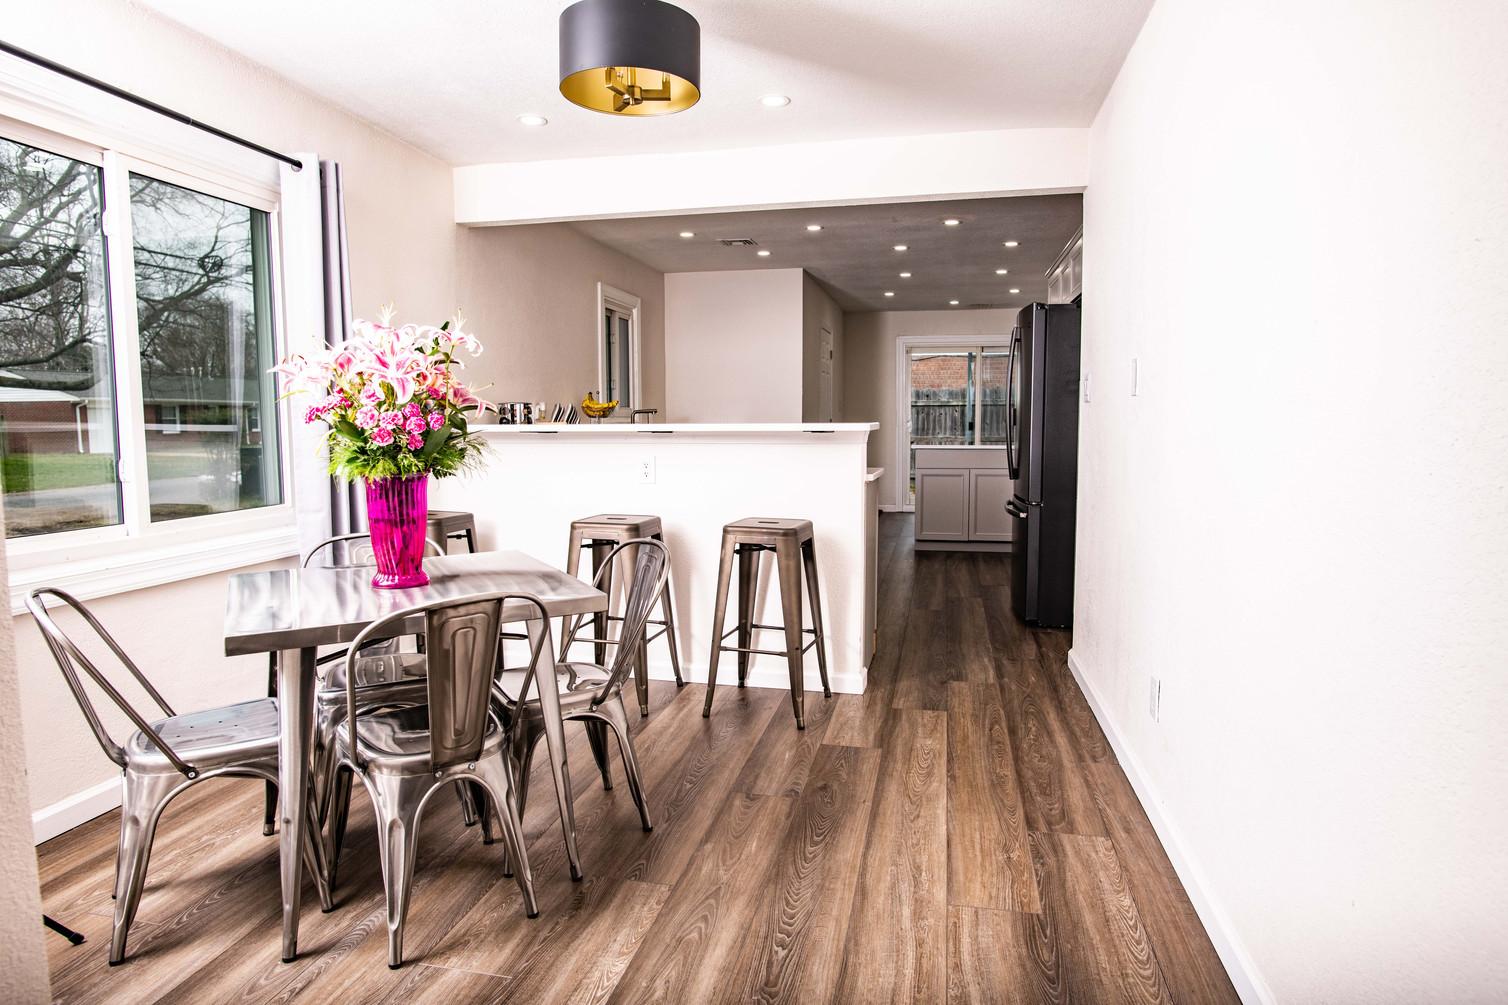 Entire house interior renovation.